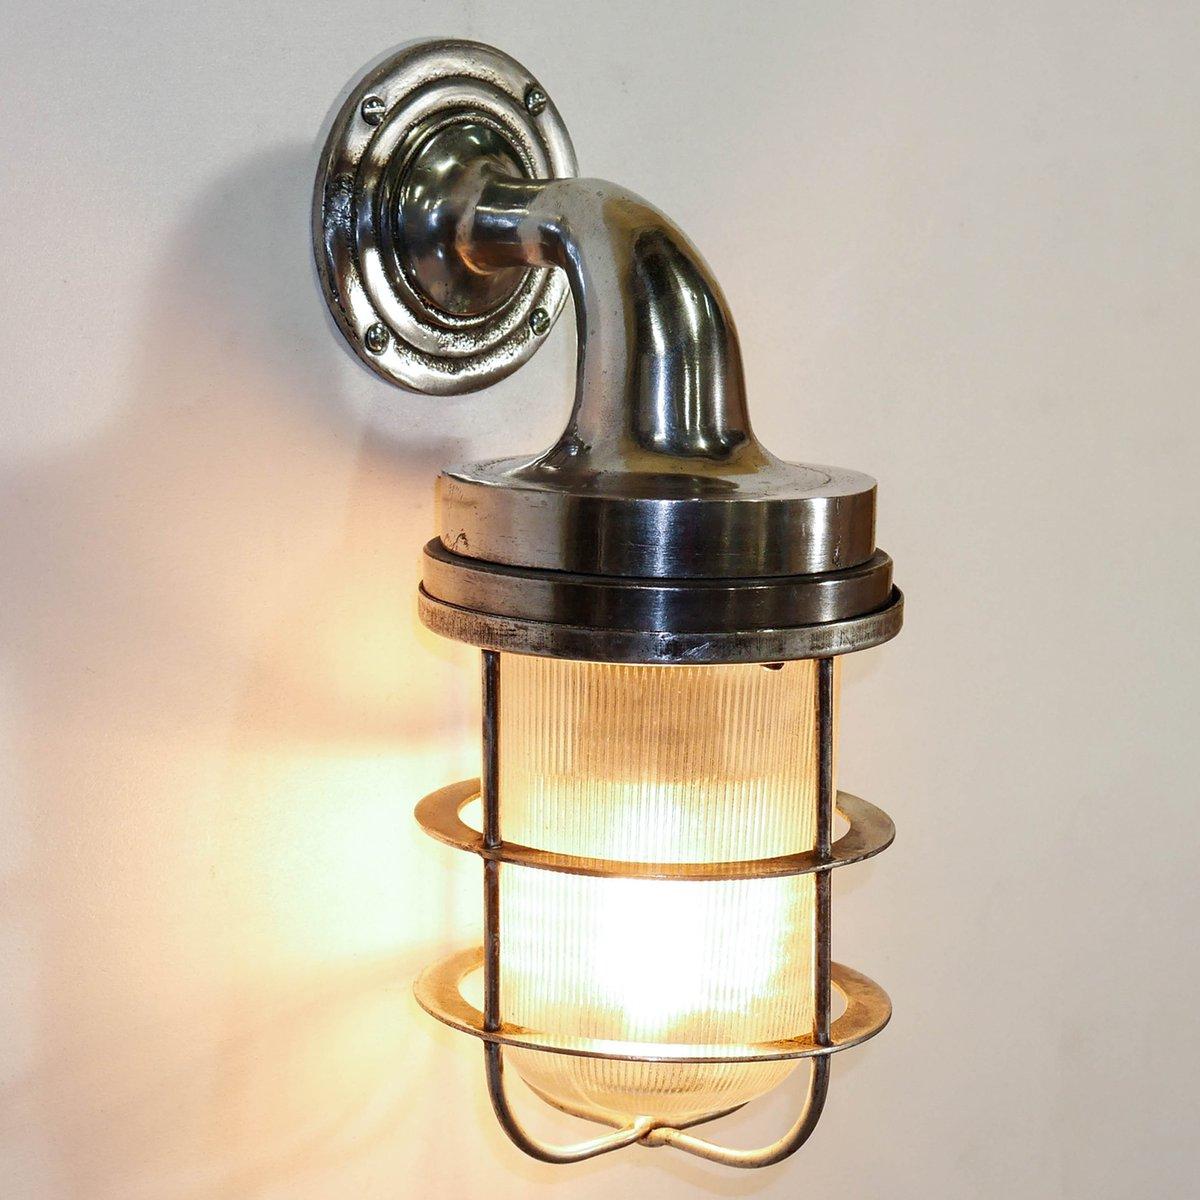 Industrielle vintage wandlampe bei pamono kaufen - Wandlampe vintage retro ...